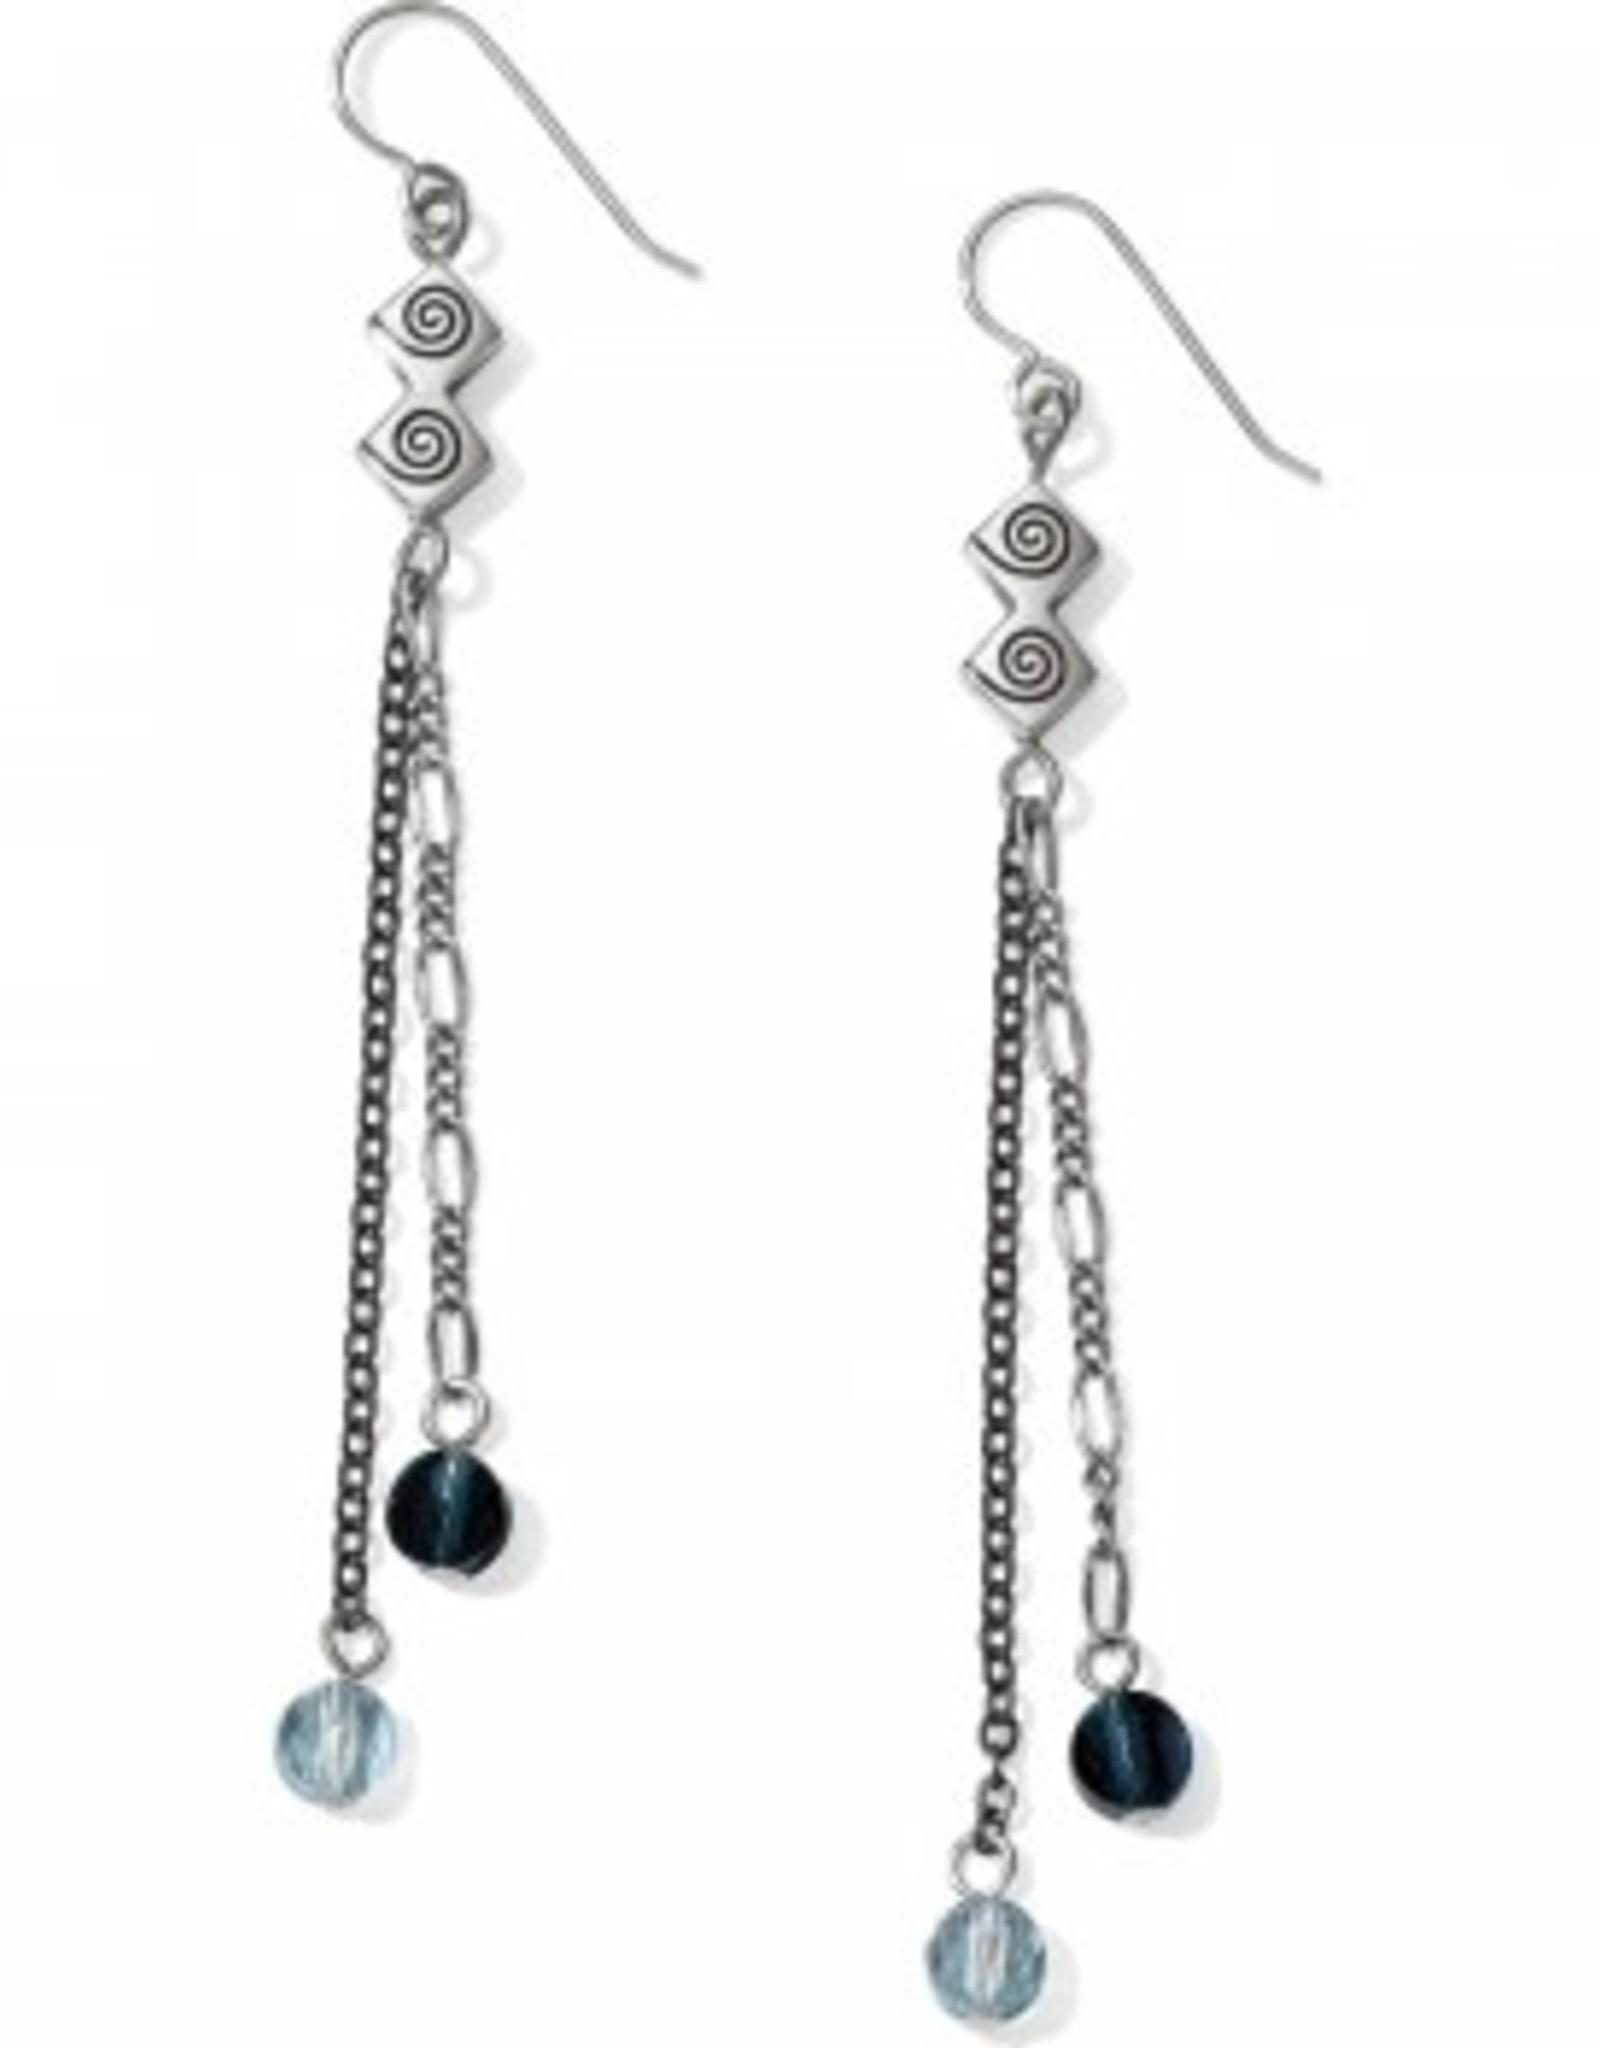 Brighton Brighton, Marrakesh Bazaar Blue French Wire Earrings